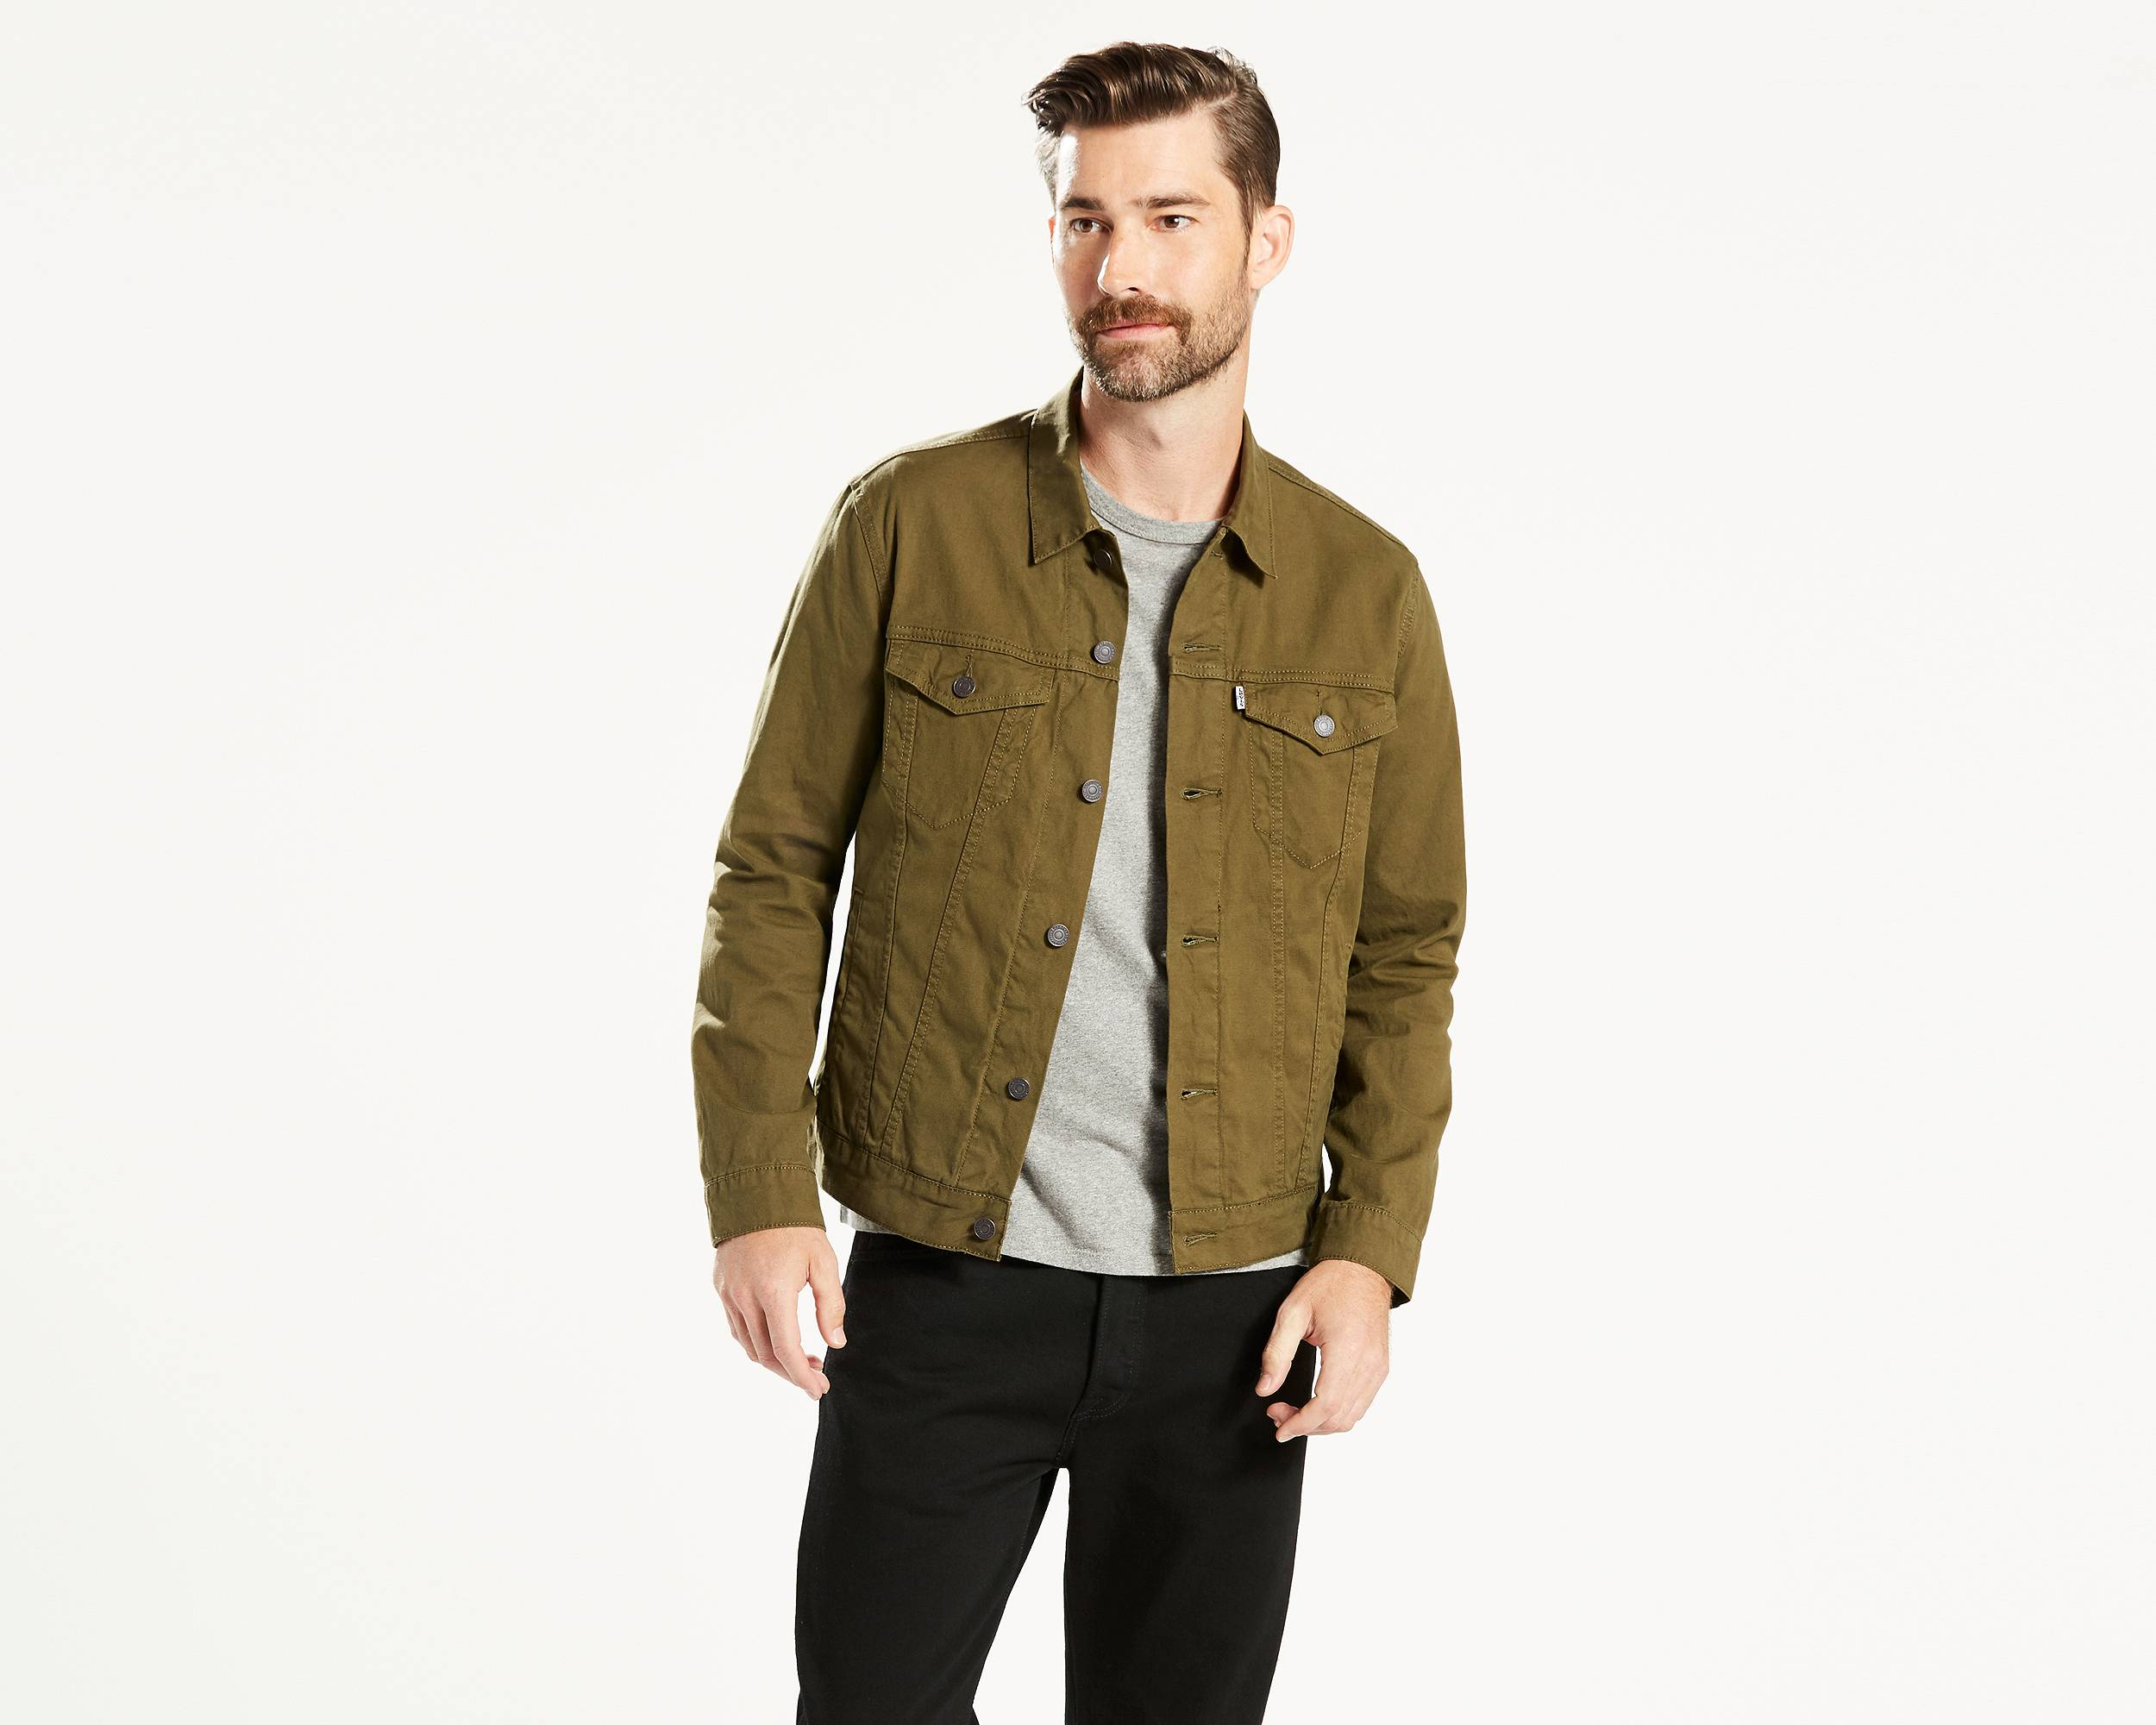 Trucker Jacket - Shop the Original Men&39s Denim Jacket | Levi&39s®